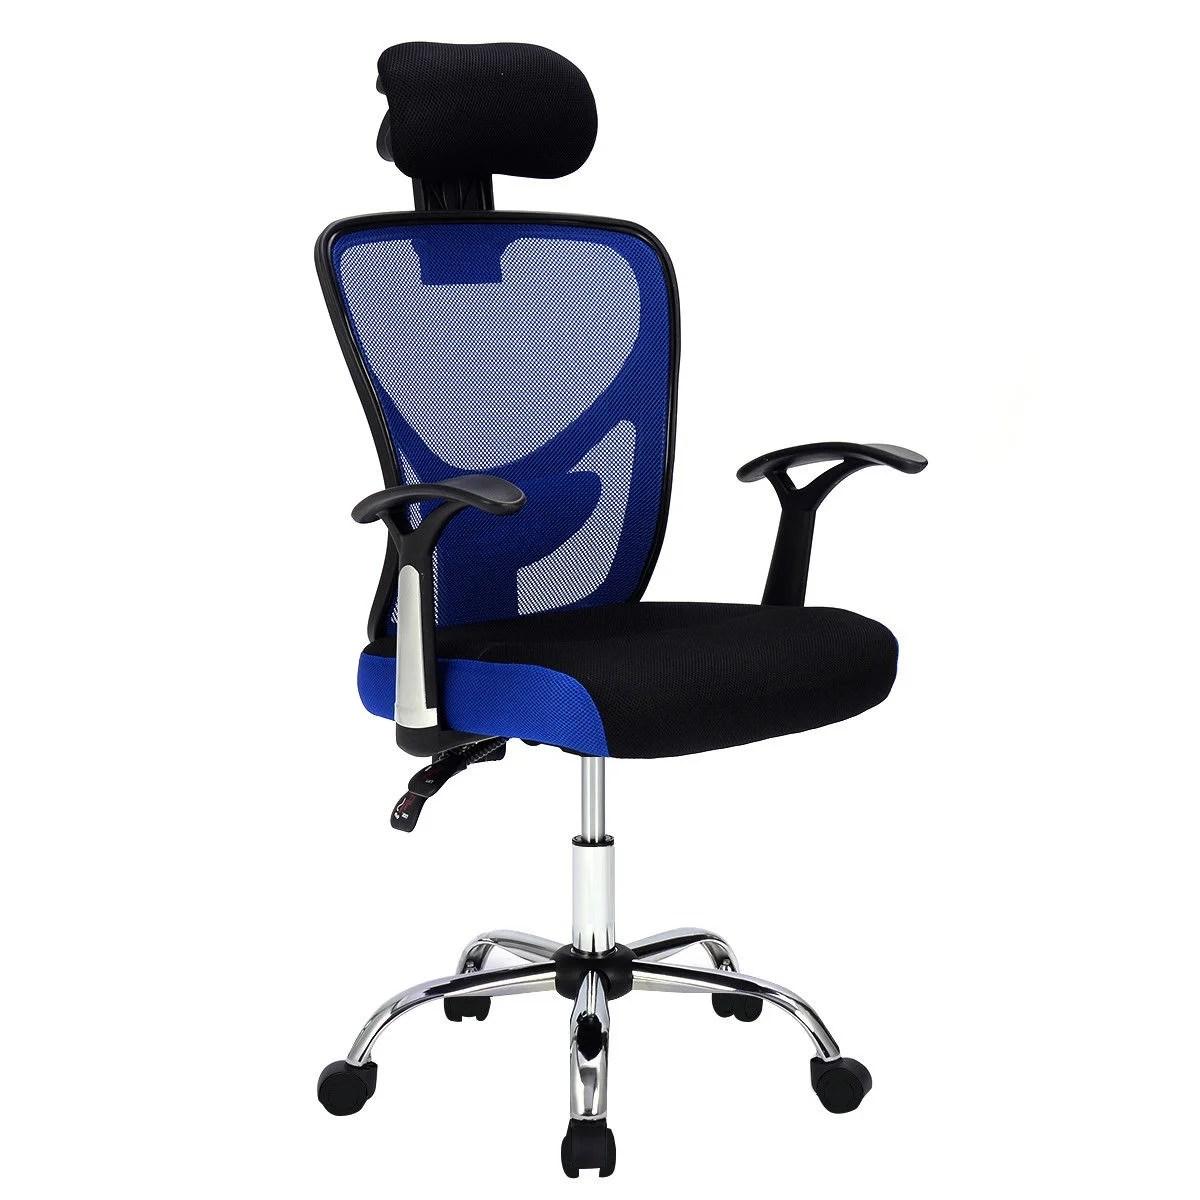 office chair posture rush seat dining chairs uk shop gymax swivel ergonomic mesh high back headrest adjustable blue